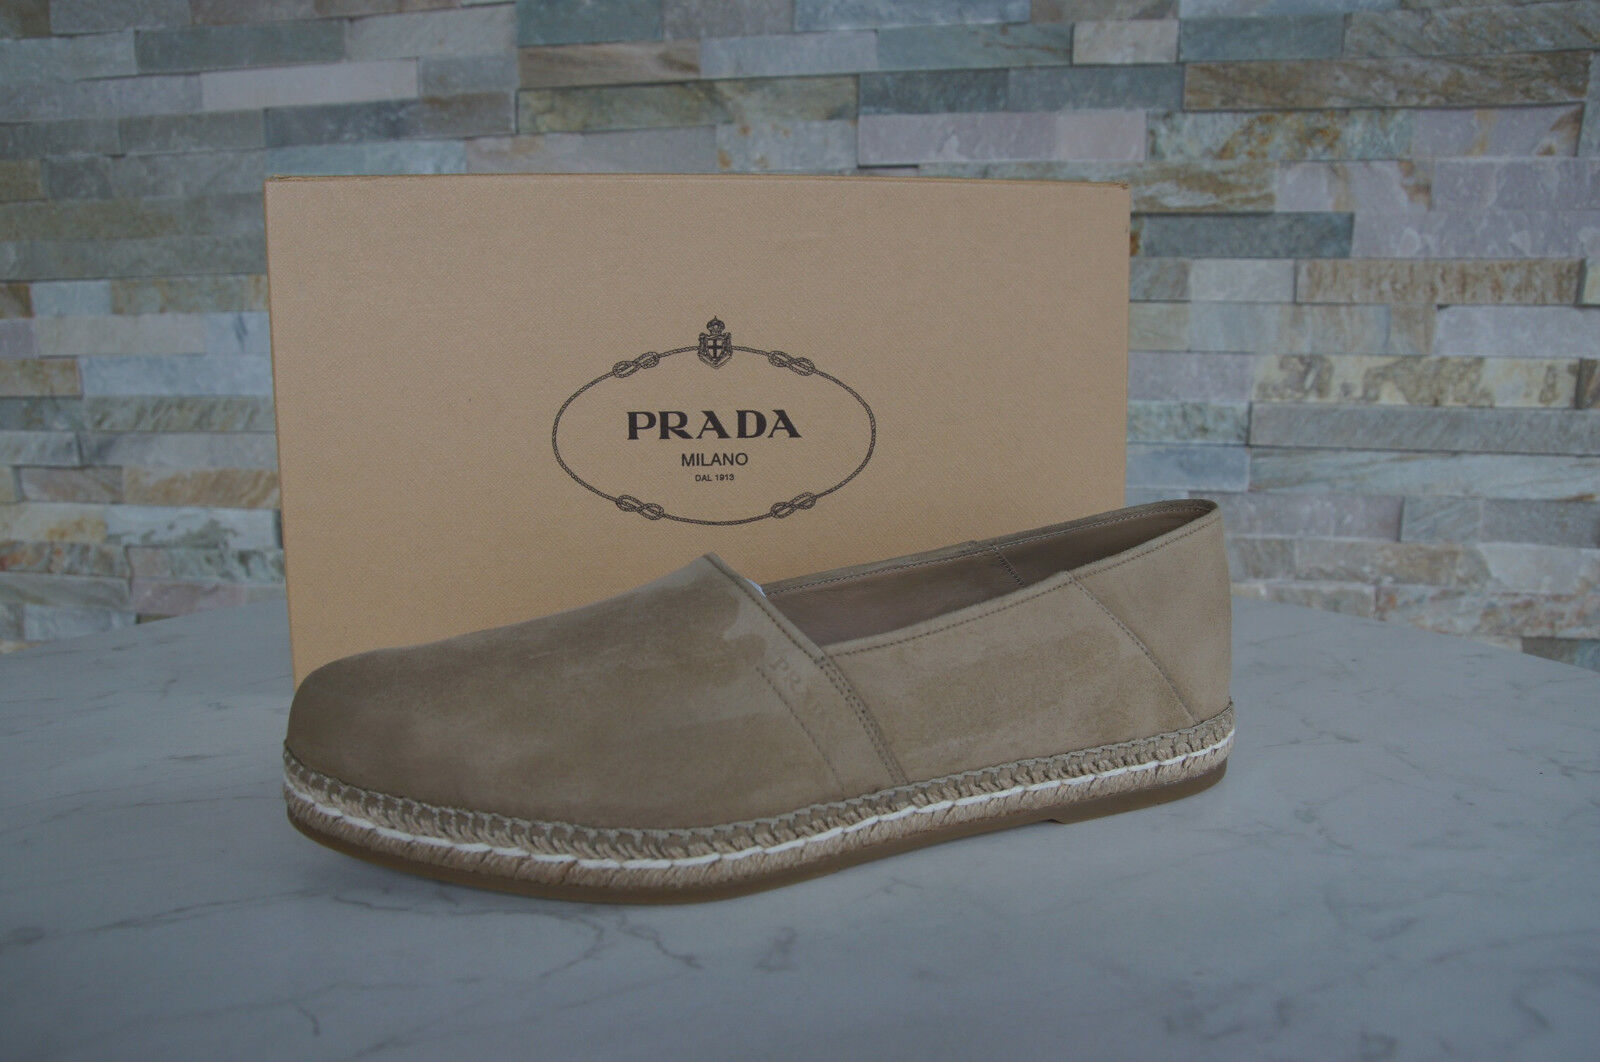 PRADA Gr 44  10 Slipper Loafers Mokassins Halbschuhe Schuhe beige NEU UVP 460